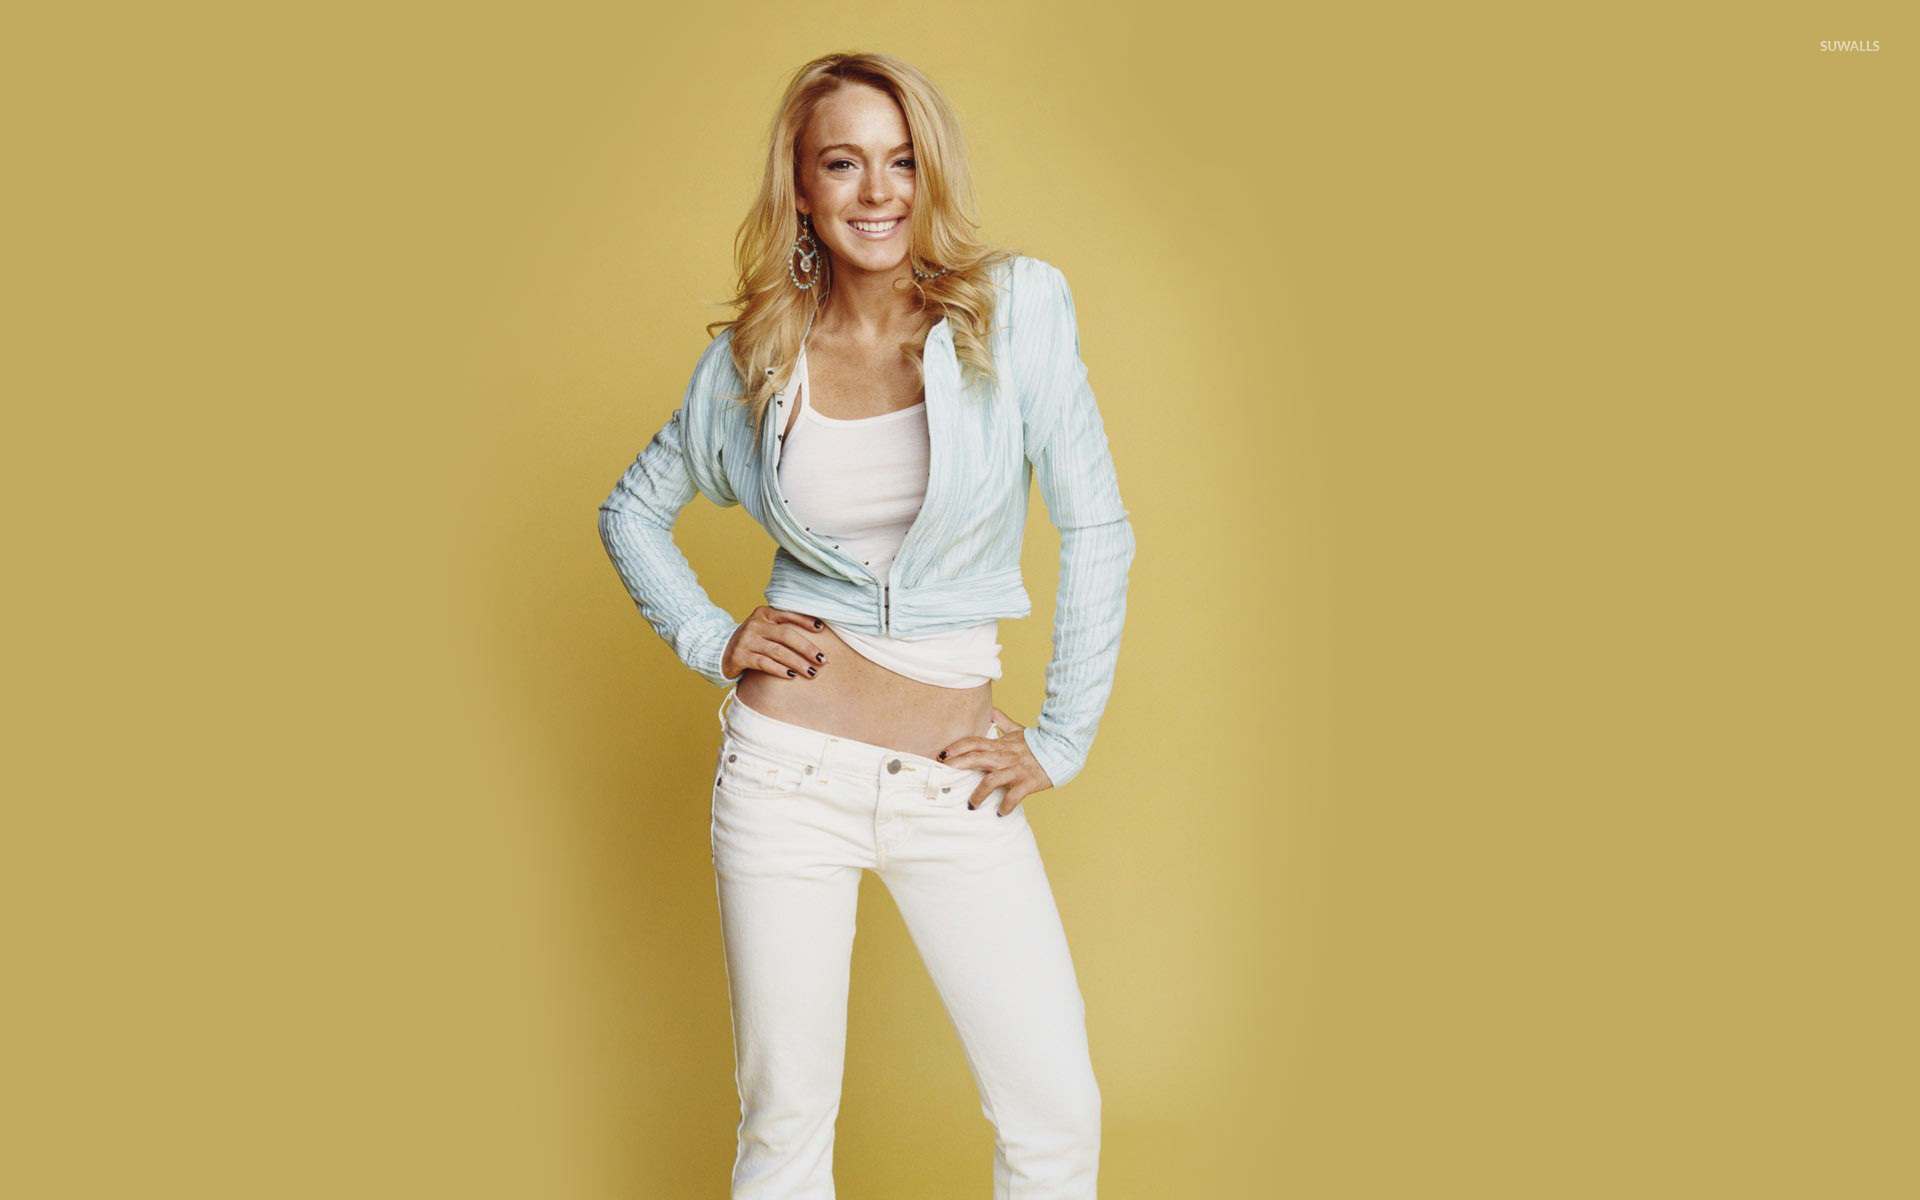 Lindsay Lohan Hot Tamales Wallpapers